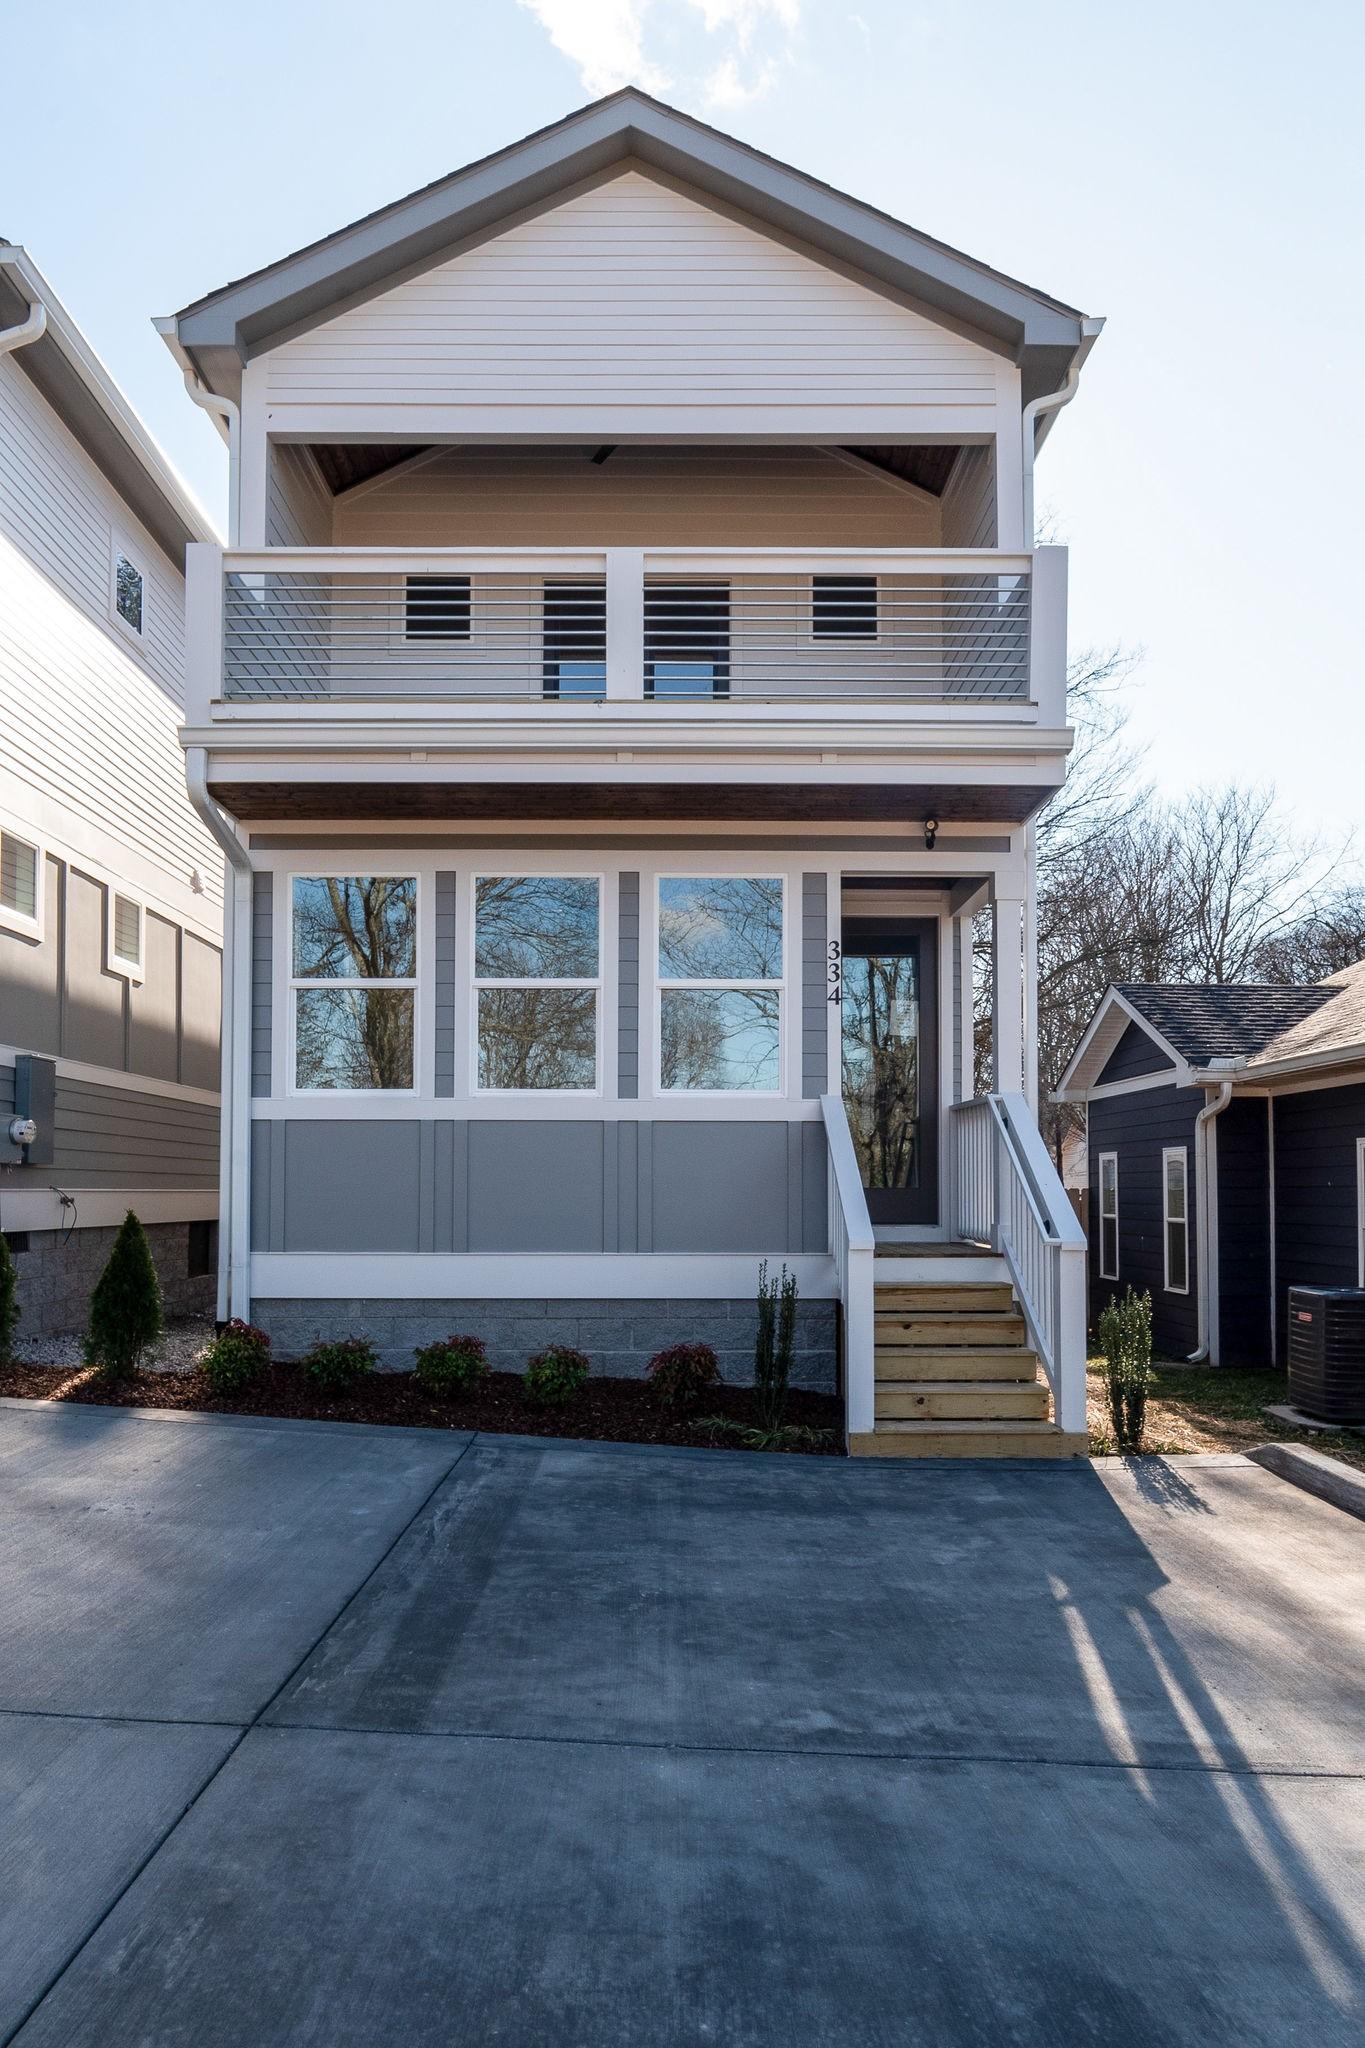 334 Queen Ave, Nashville, TN 37207 - Nashville, TN real estate listing